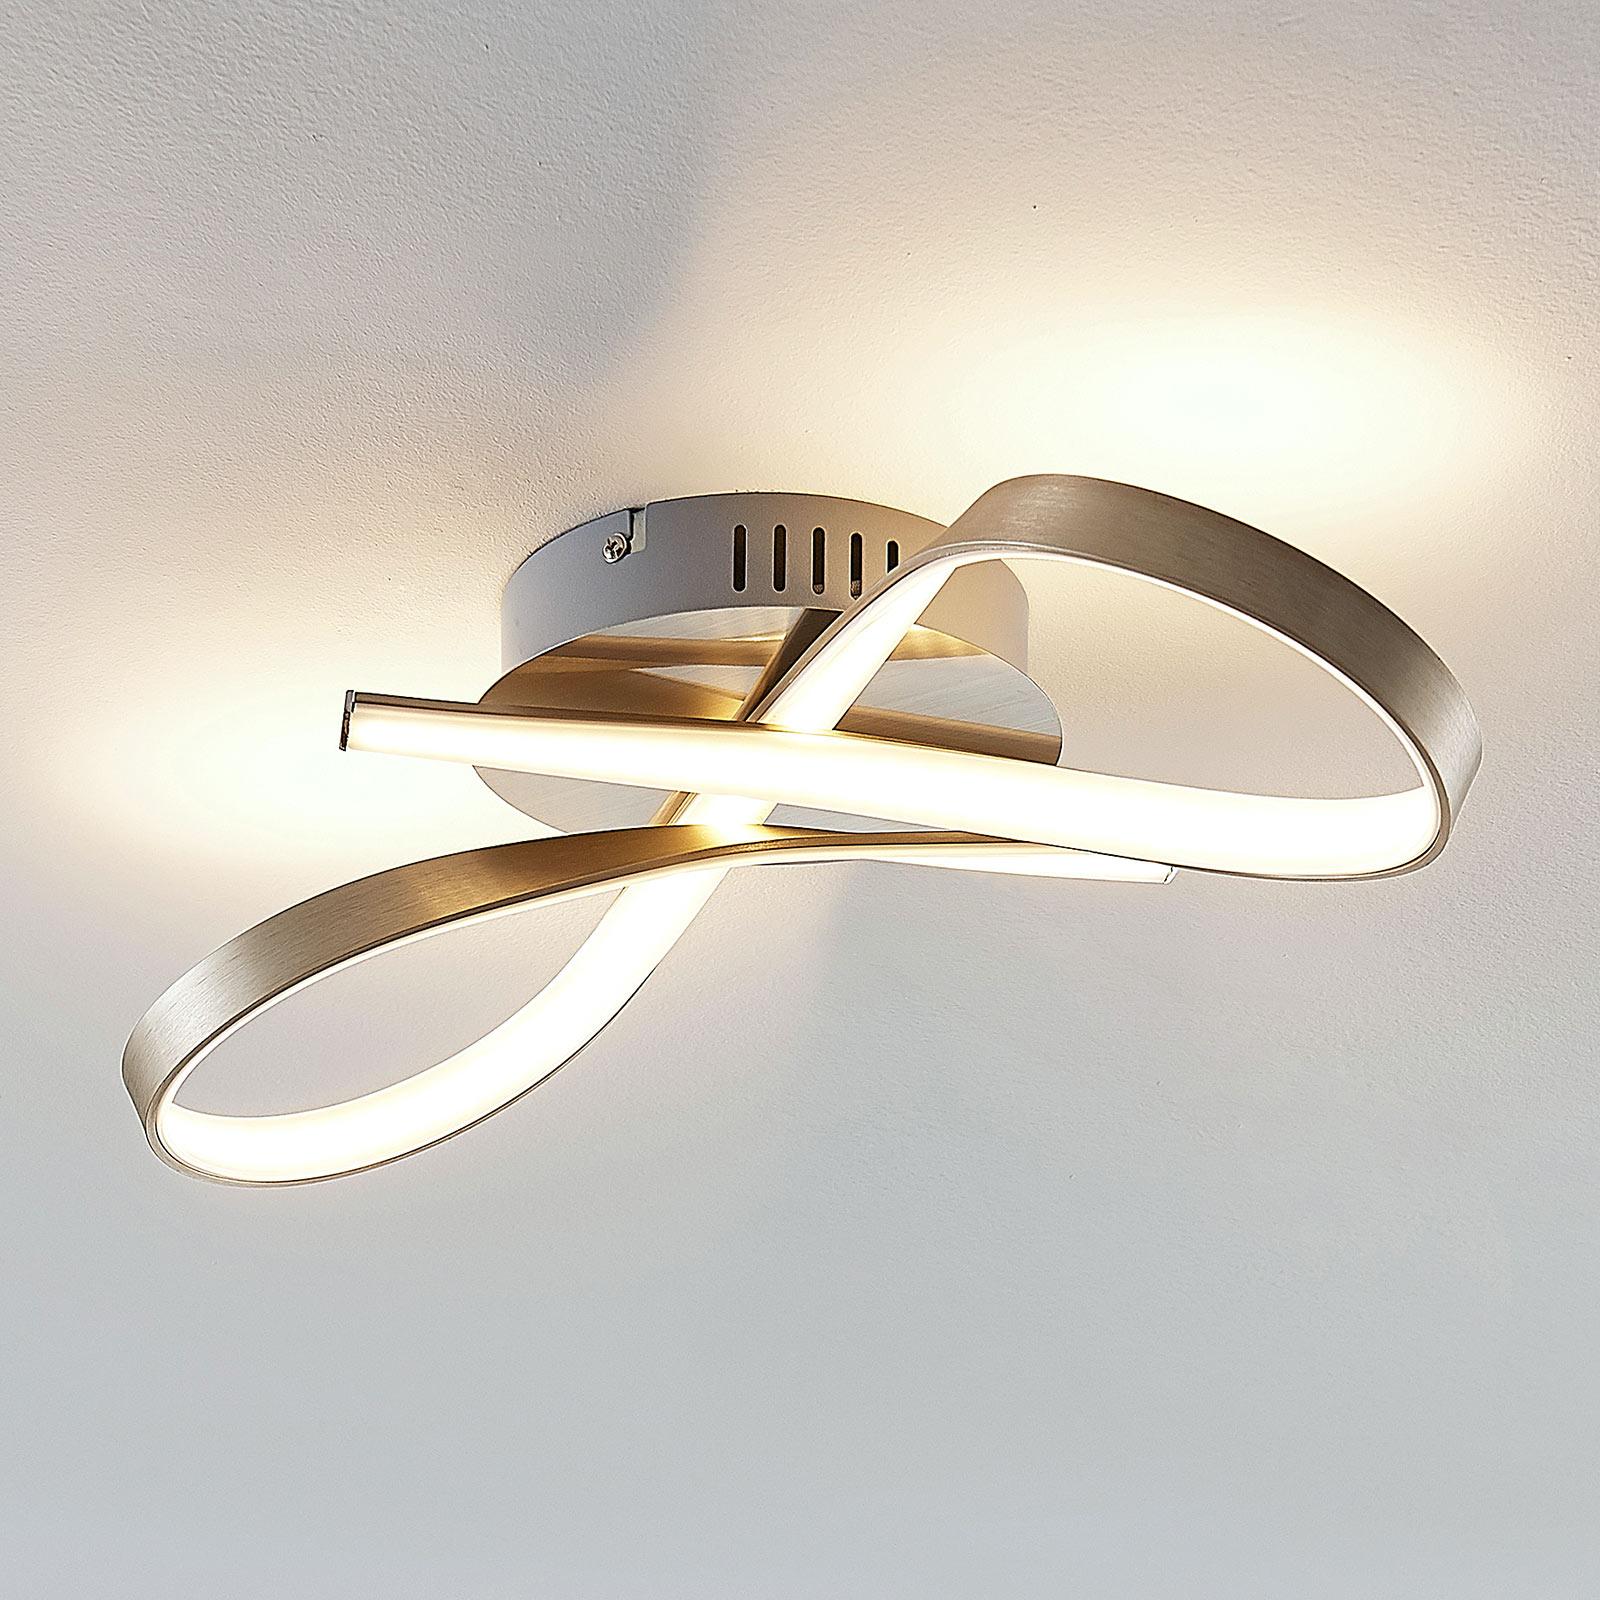 Plafonnier LED Alana, en forme de flot